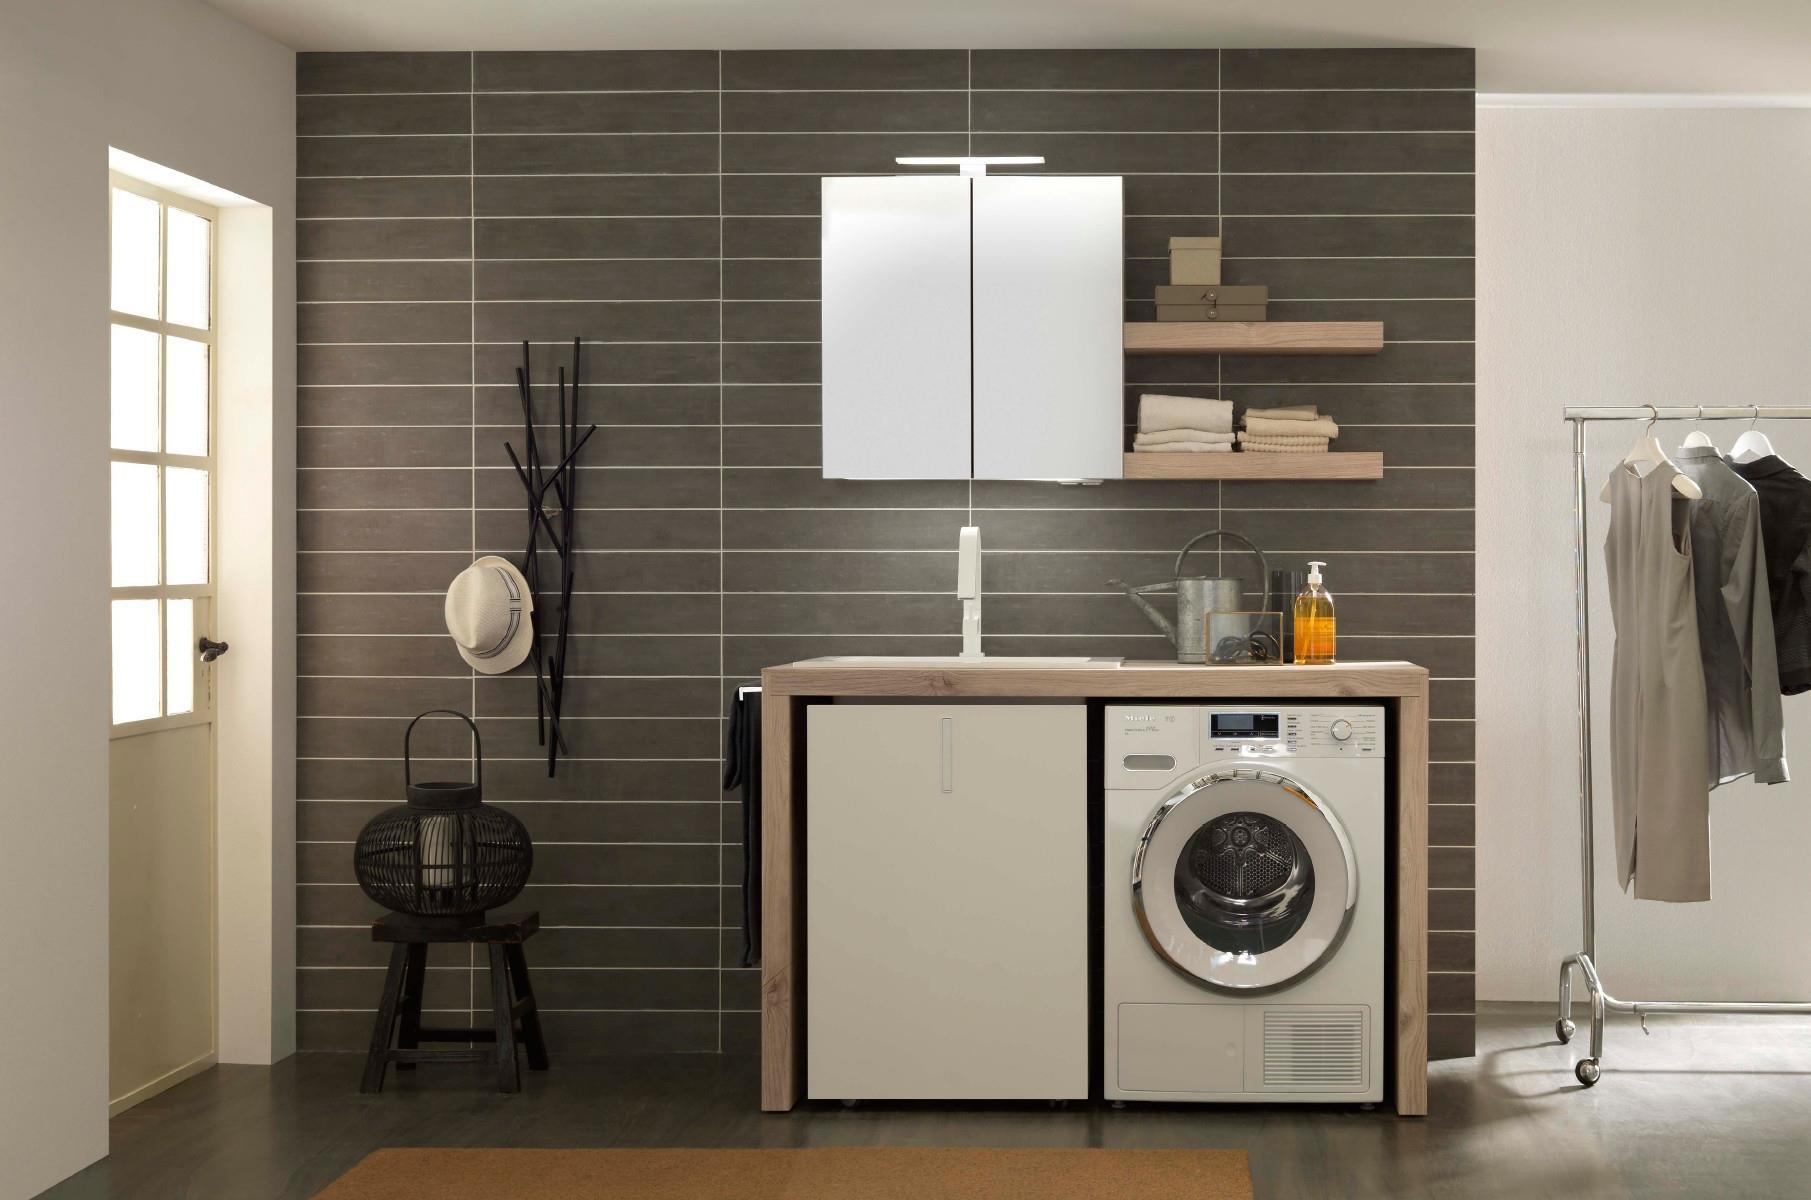 Sanitari & arredo bagno alto adige limewash lavanderia di azzurrabagni